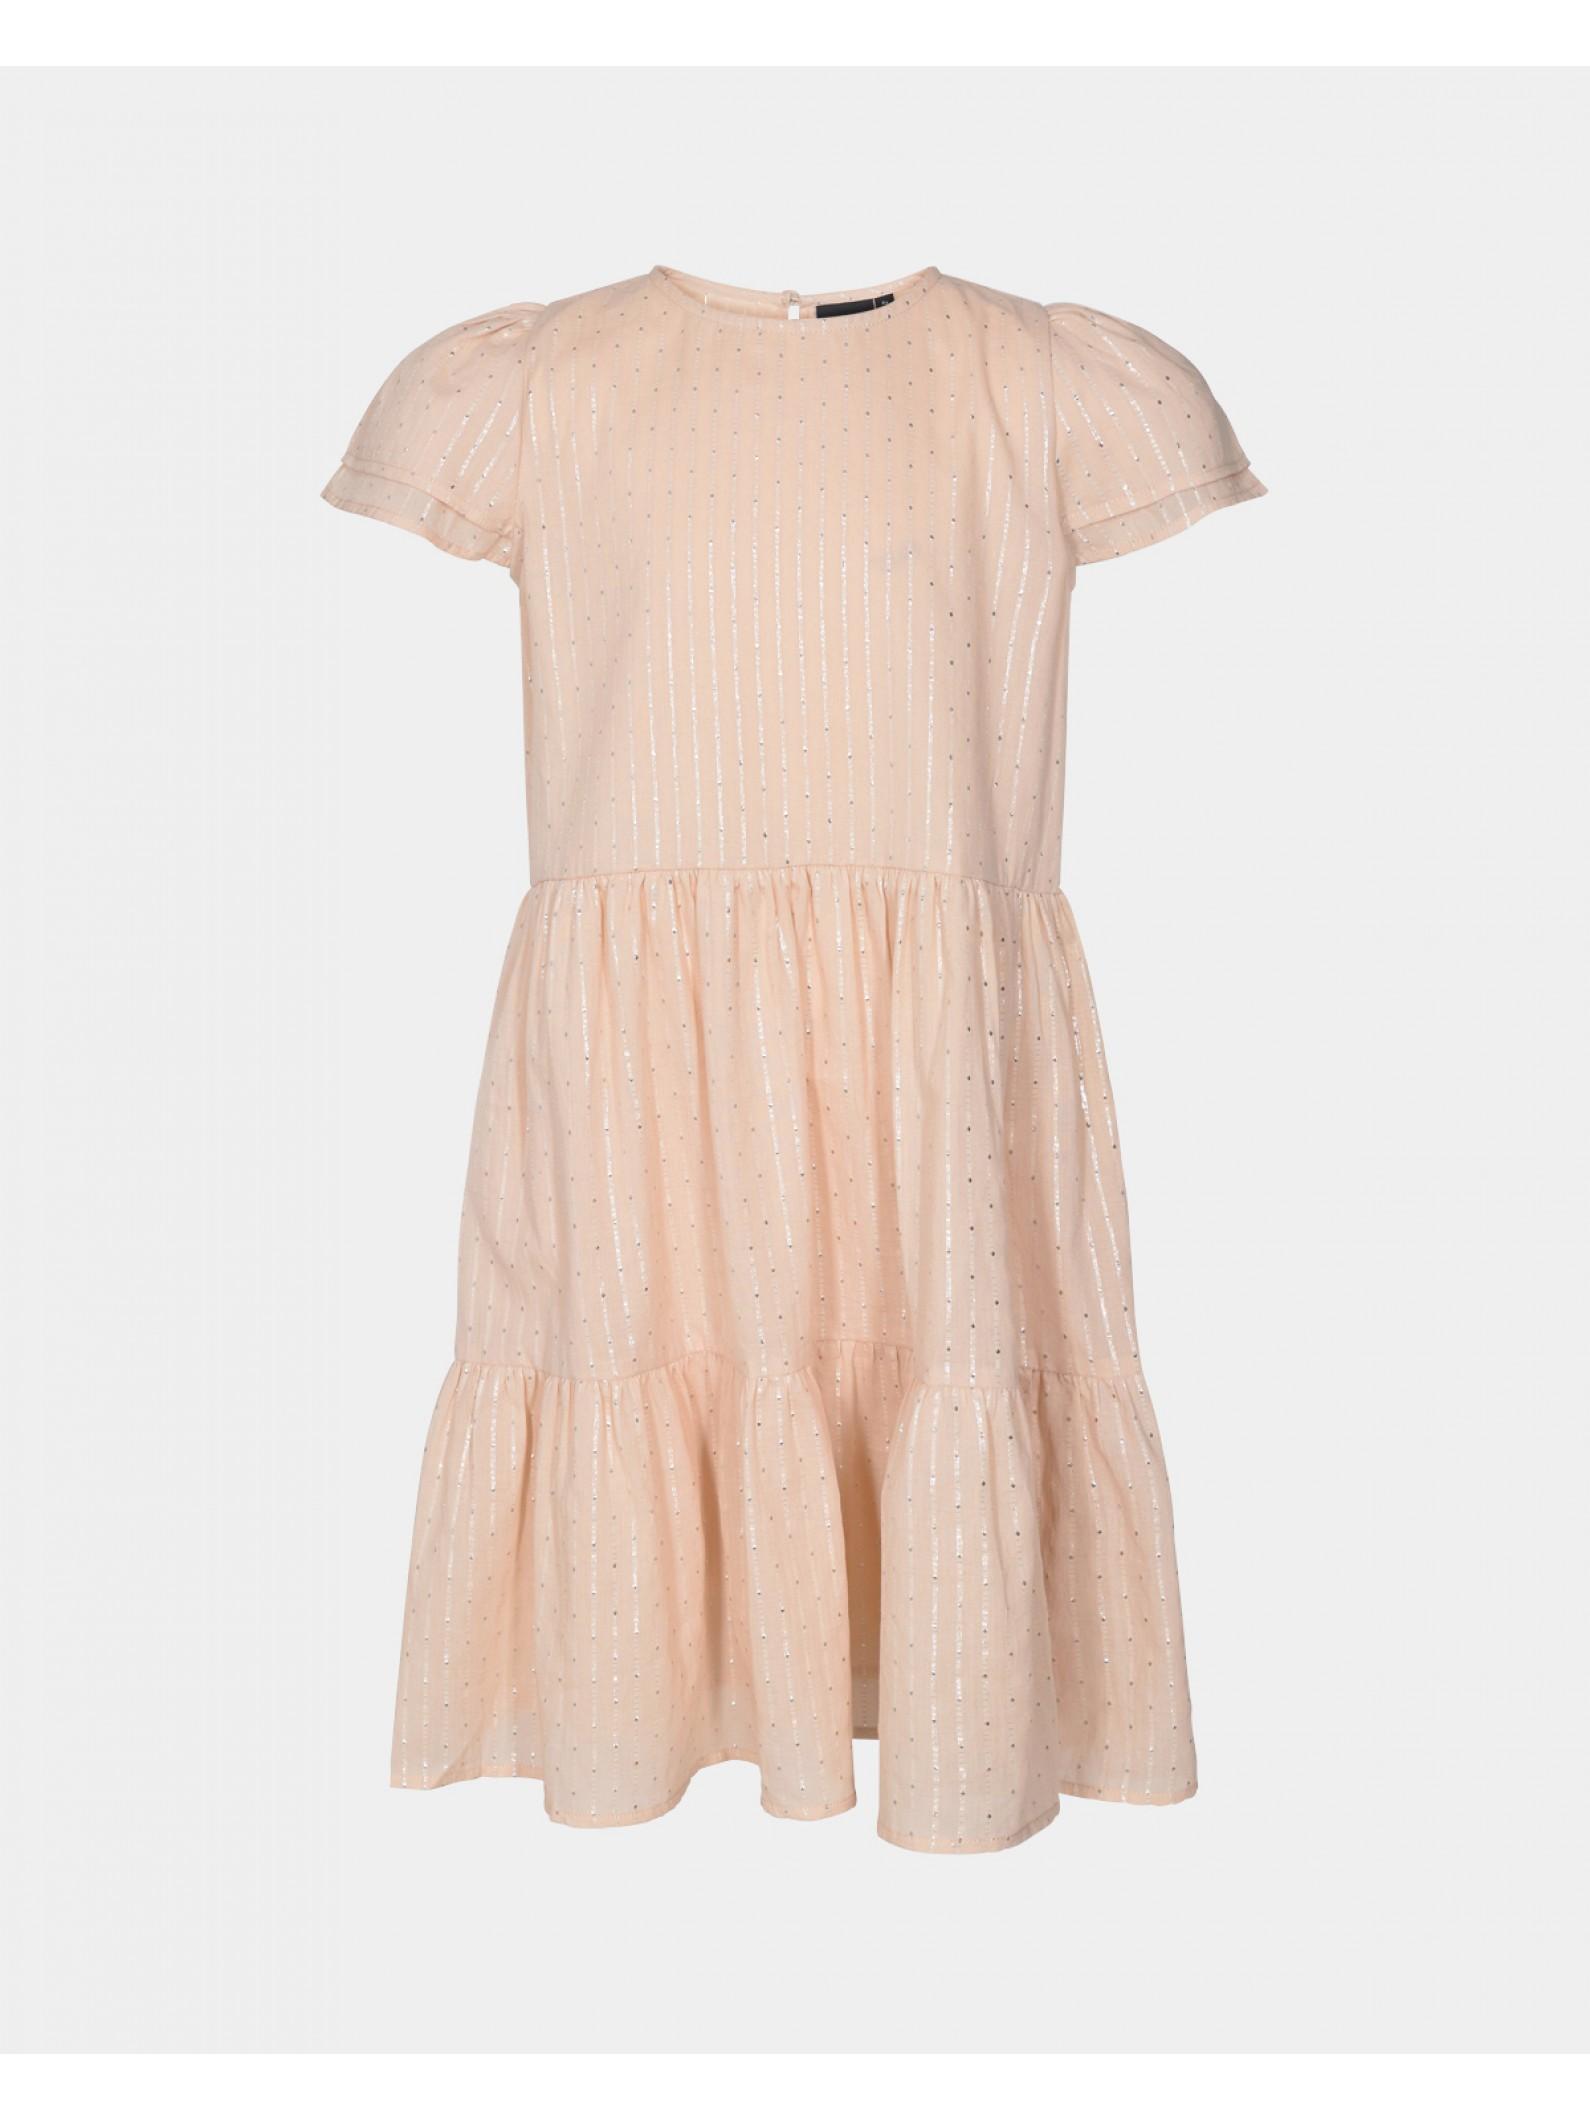 Petit by Sofie Schnoor Marlena kjole, light rose, 128